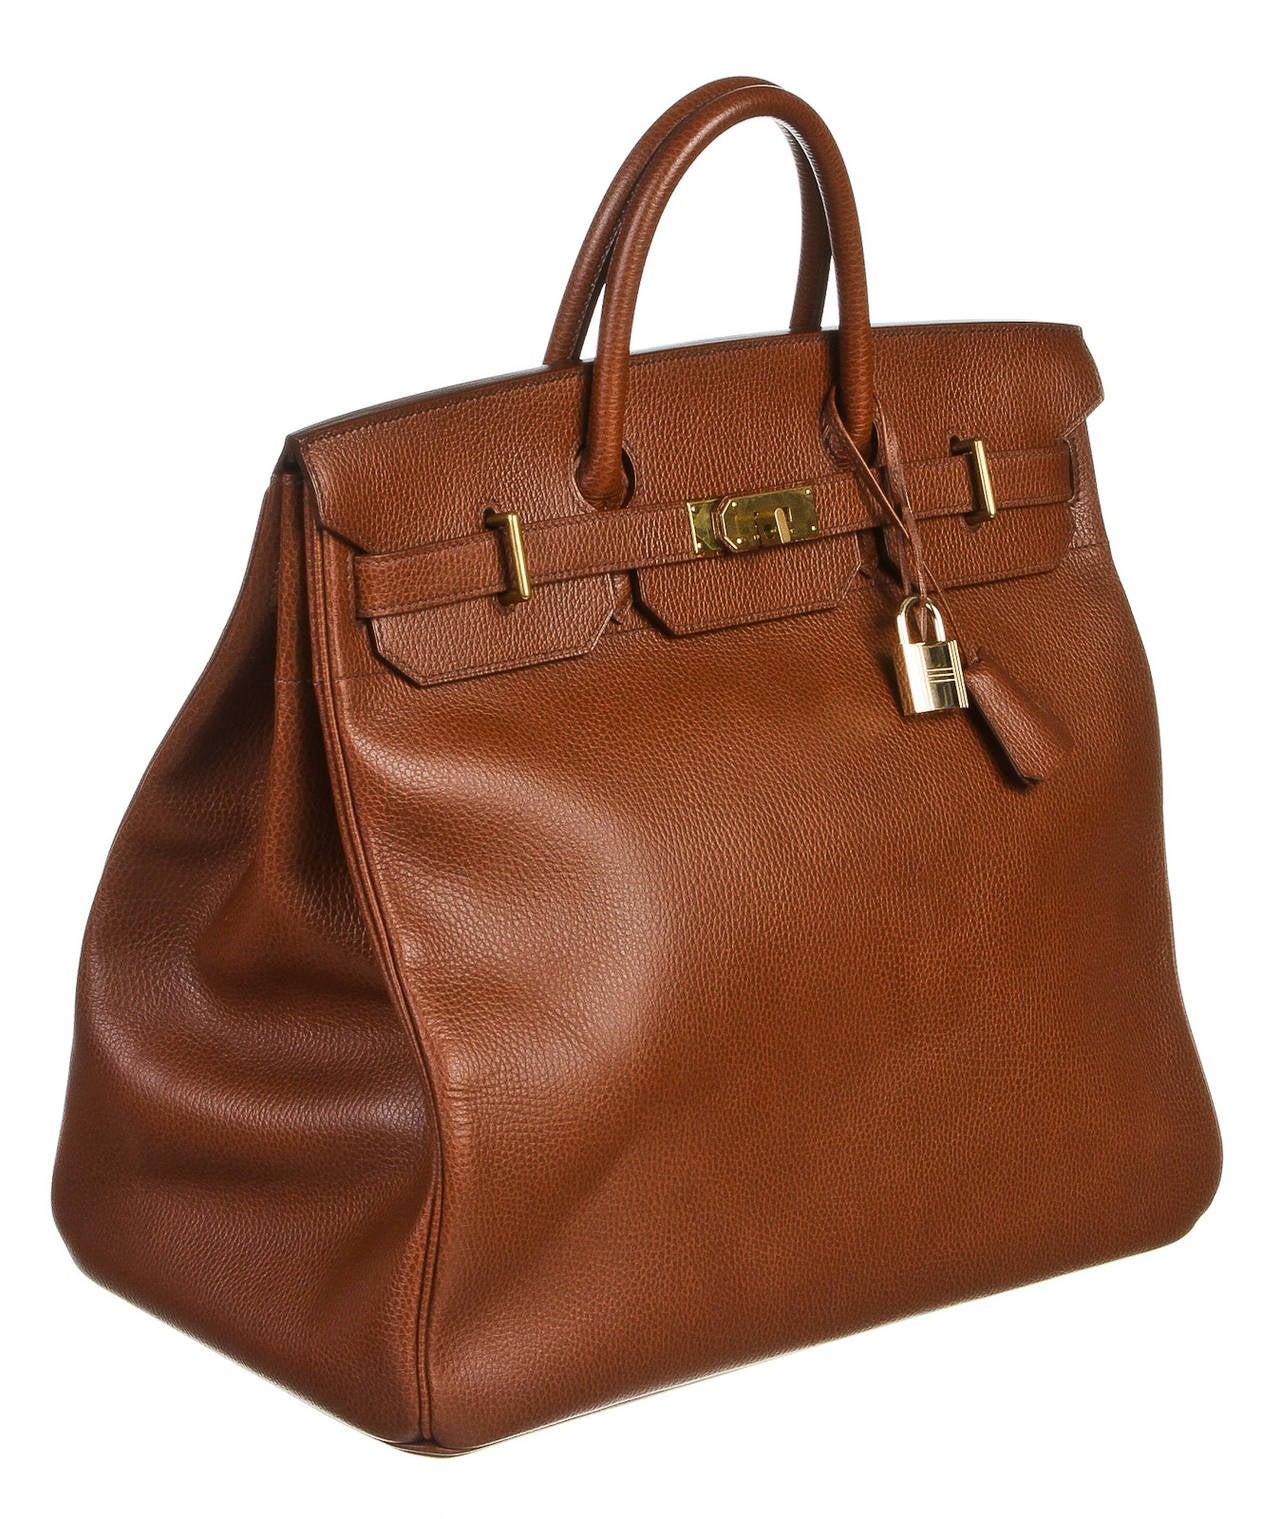 Hermes Brown Leather 45cm HAC Birkin Handbag at 1stdibs